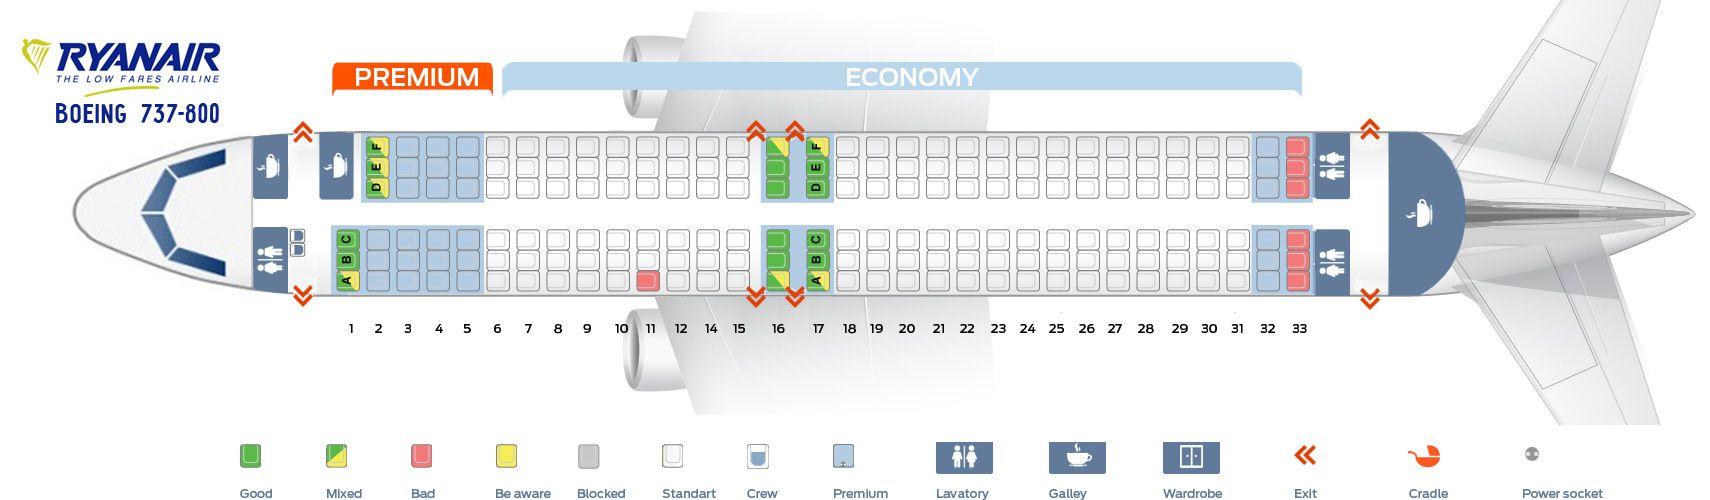 Ryanair Fleet Boeing 737 800 Details And Pictures Boeing Boeing